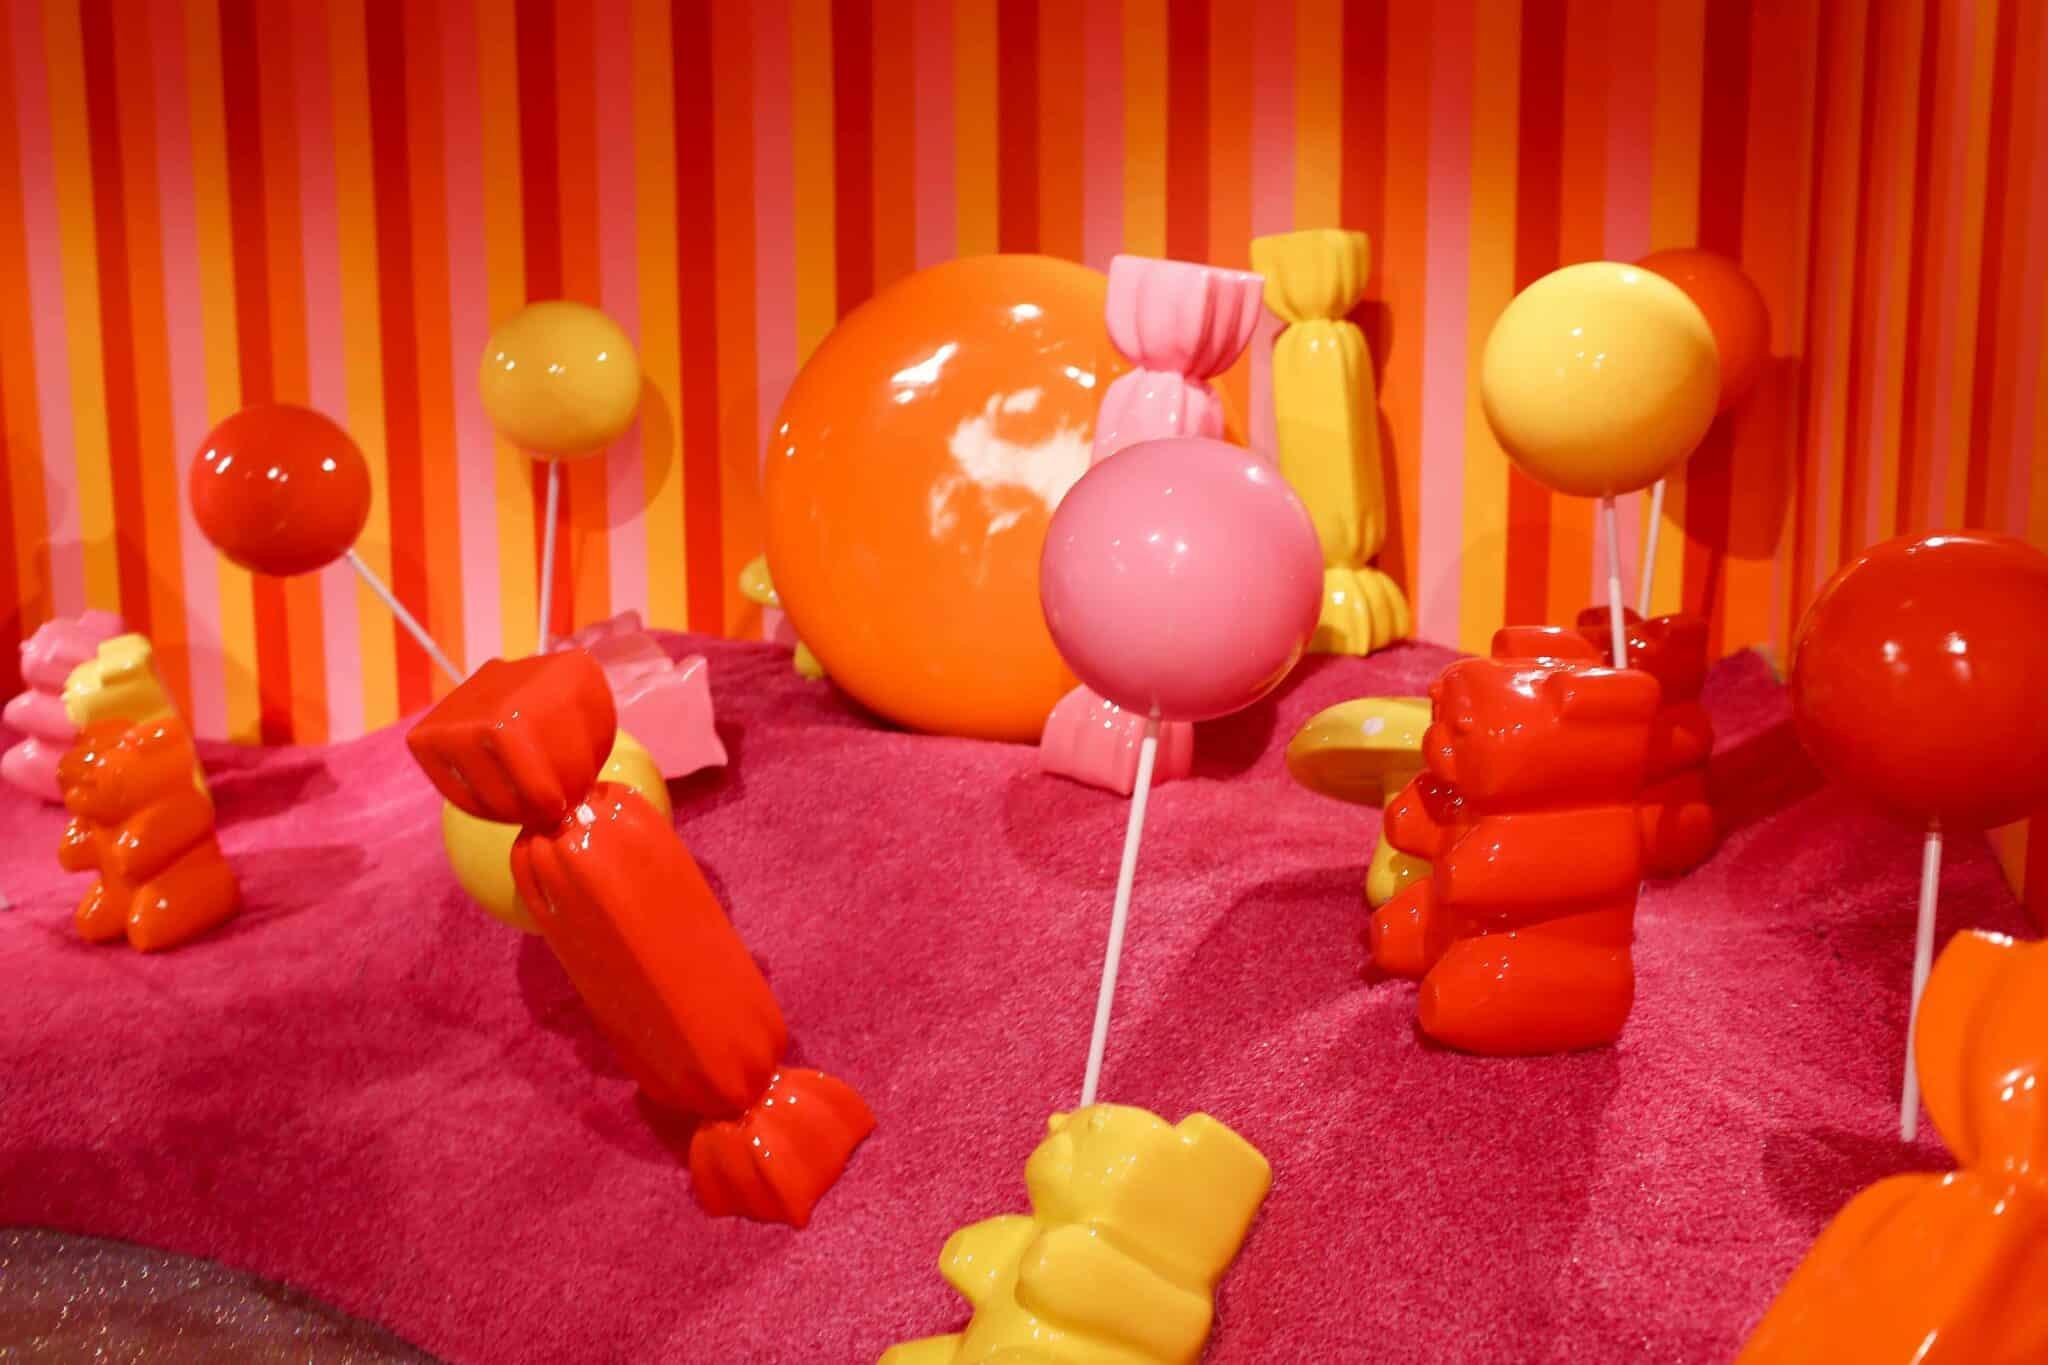 Museum of Ice Cream San Francisco gummy bear room